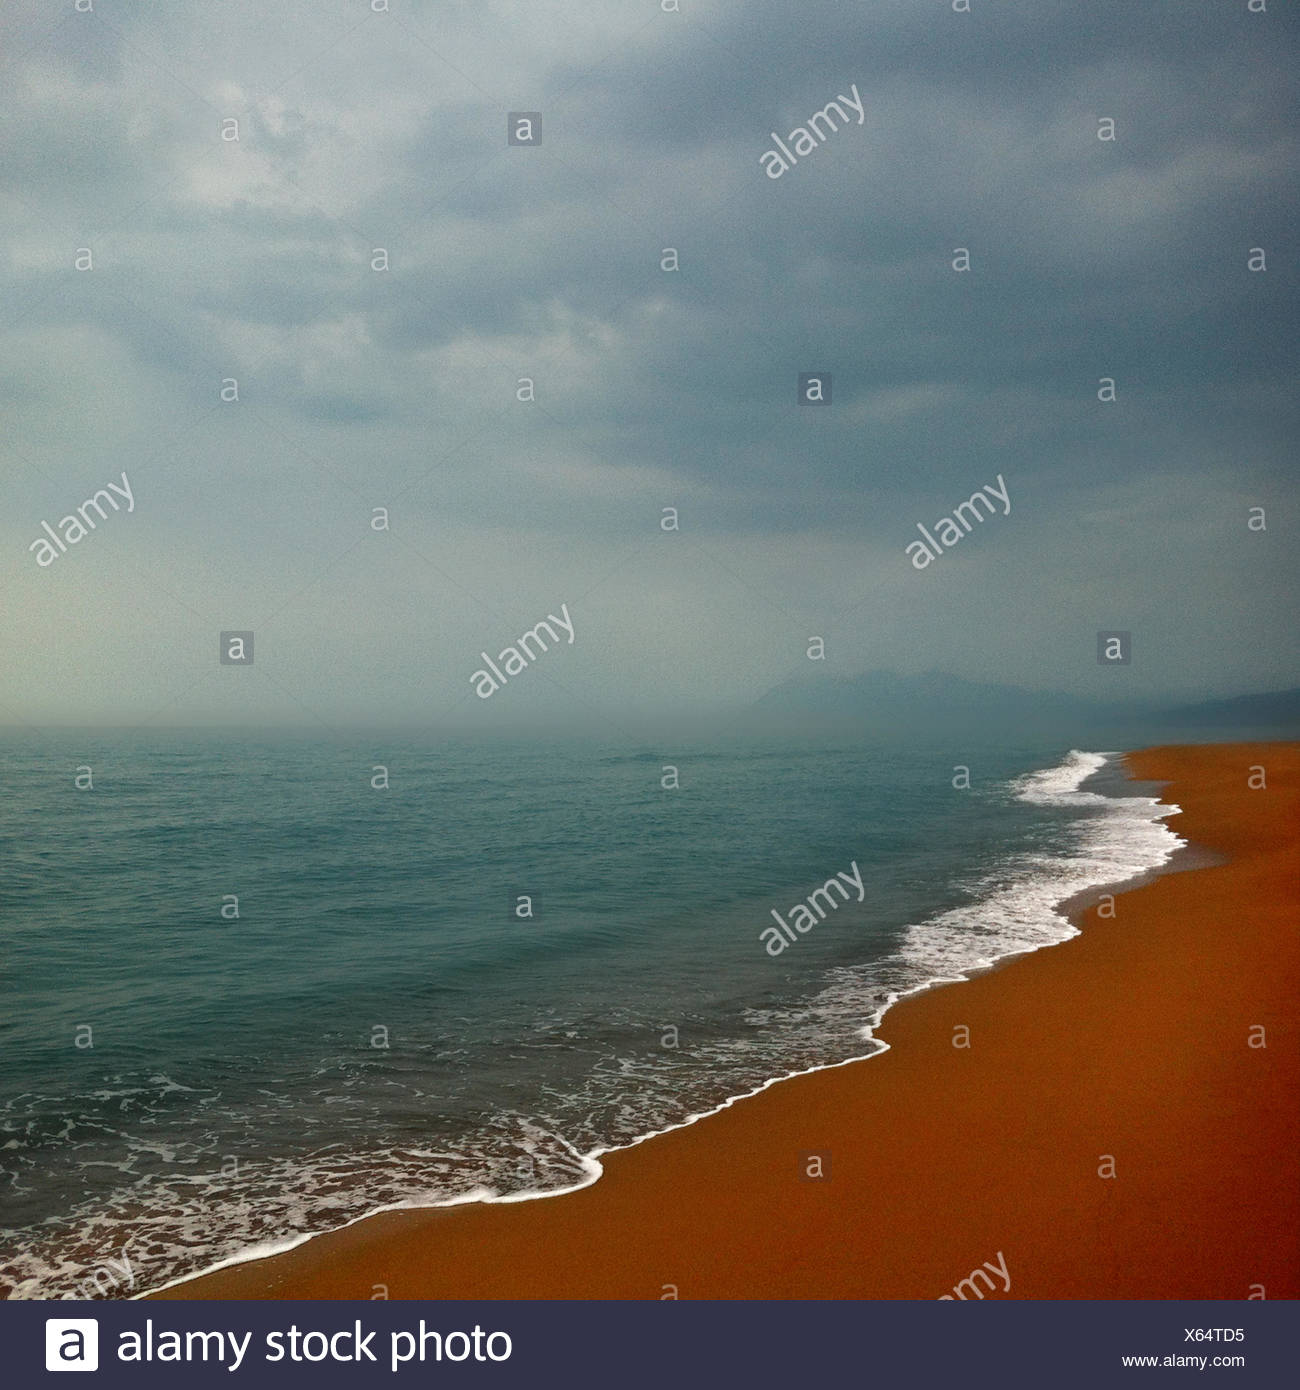 Greece, Peloponnese Periphery, Messenia Prefecture, Kyparissia, Coastline - Stock Image